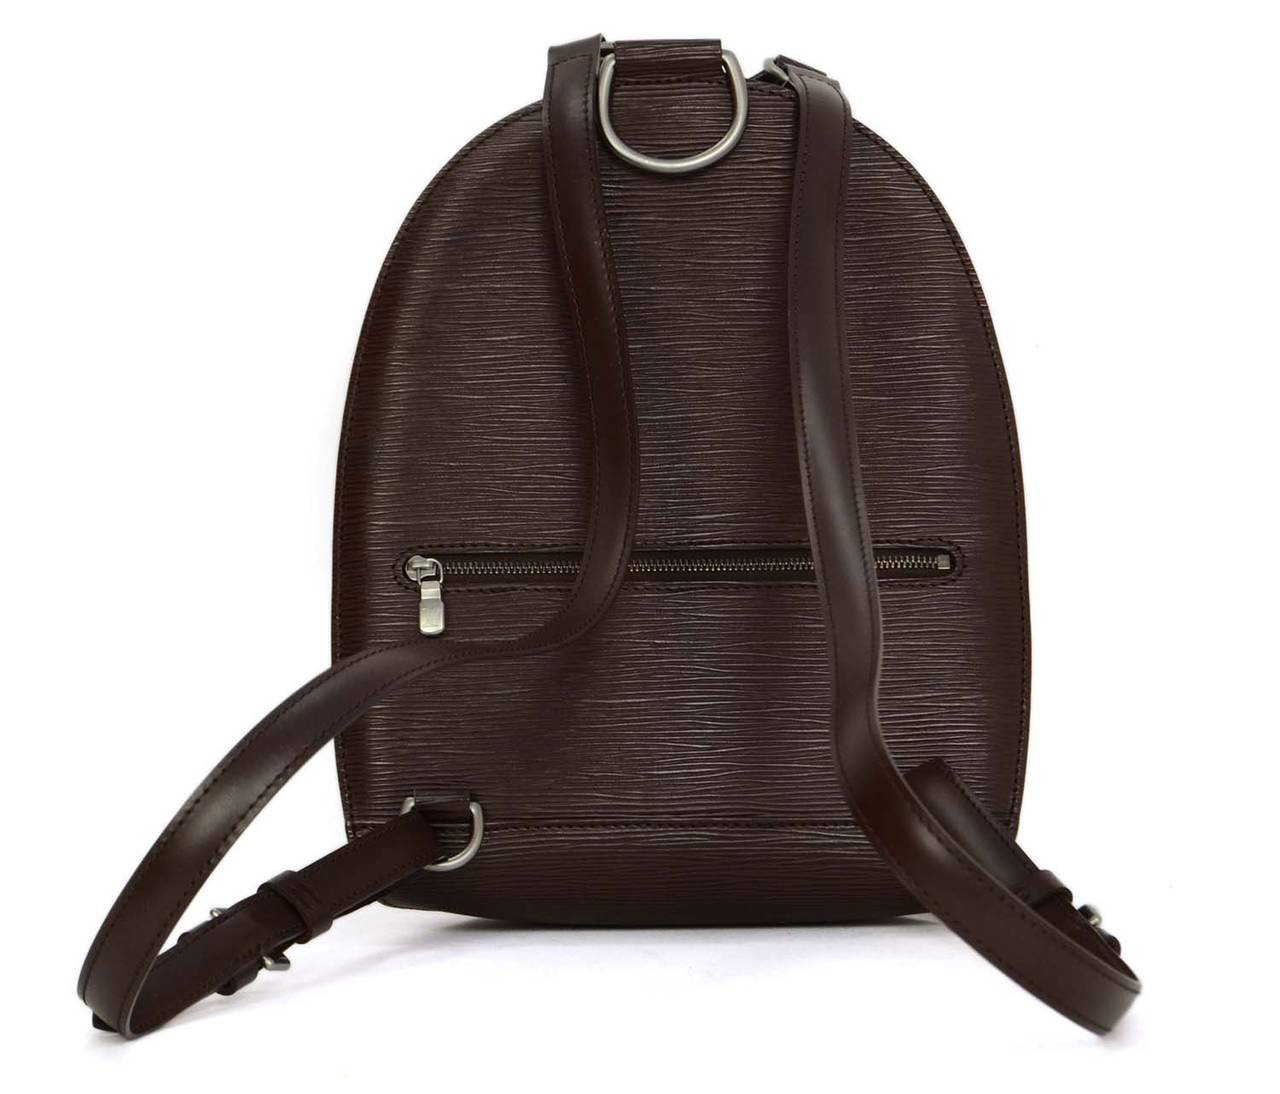 Sac A Dos Louis Vuitton Michael : Louis vuitton mocha epi quot sac a dos backpack shw at stdibs